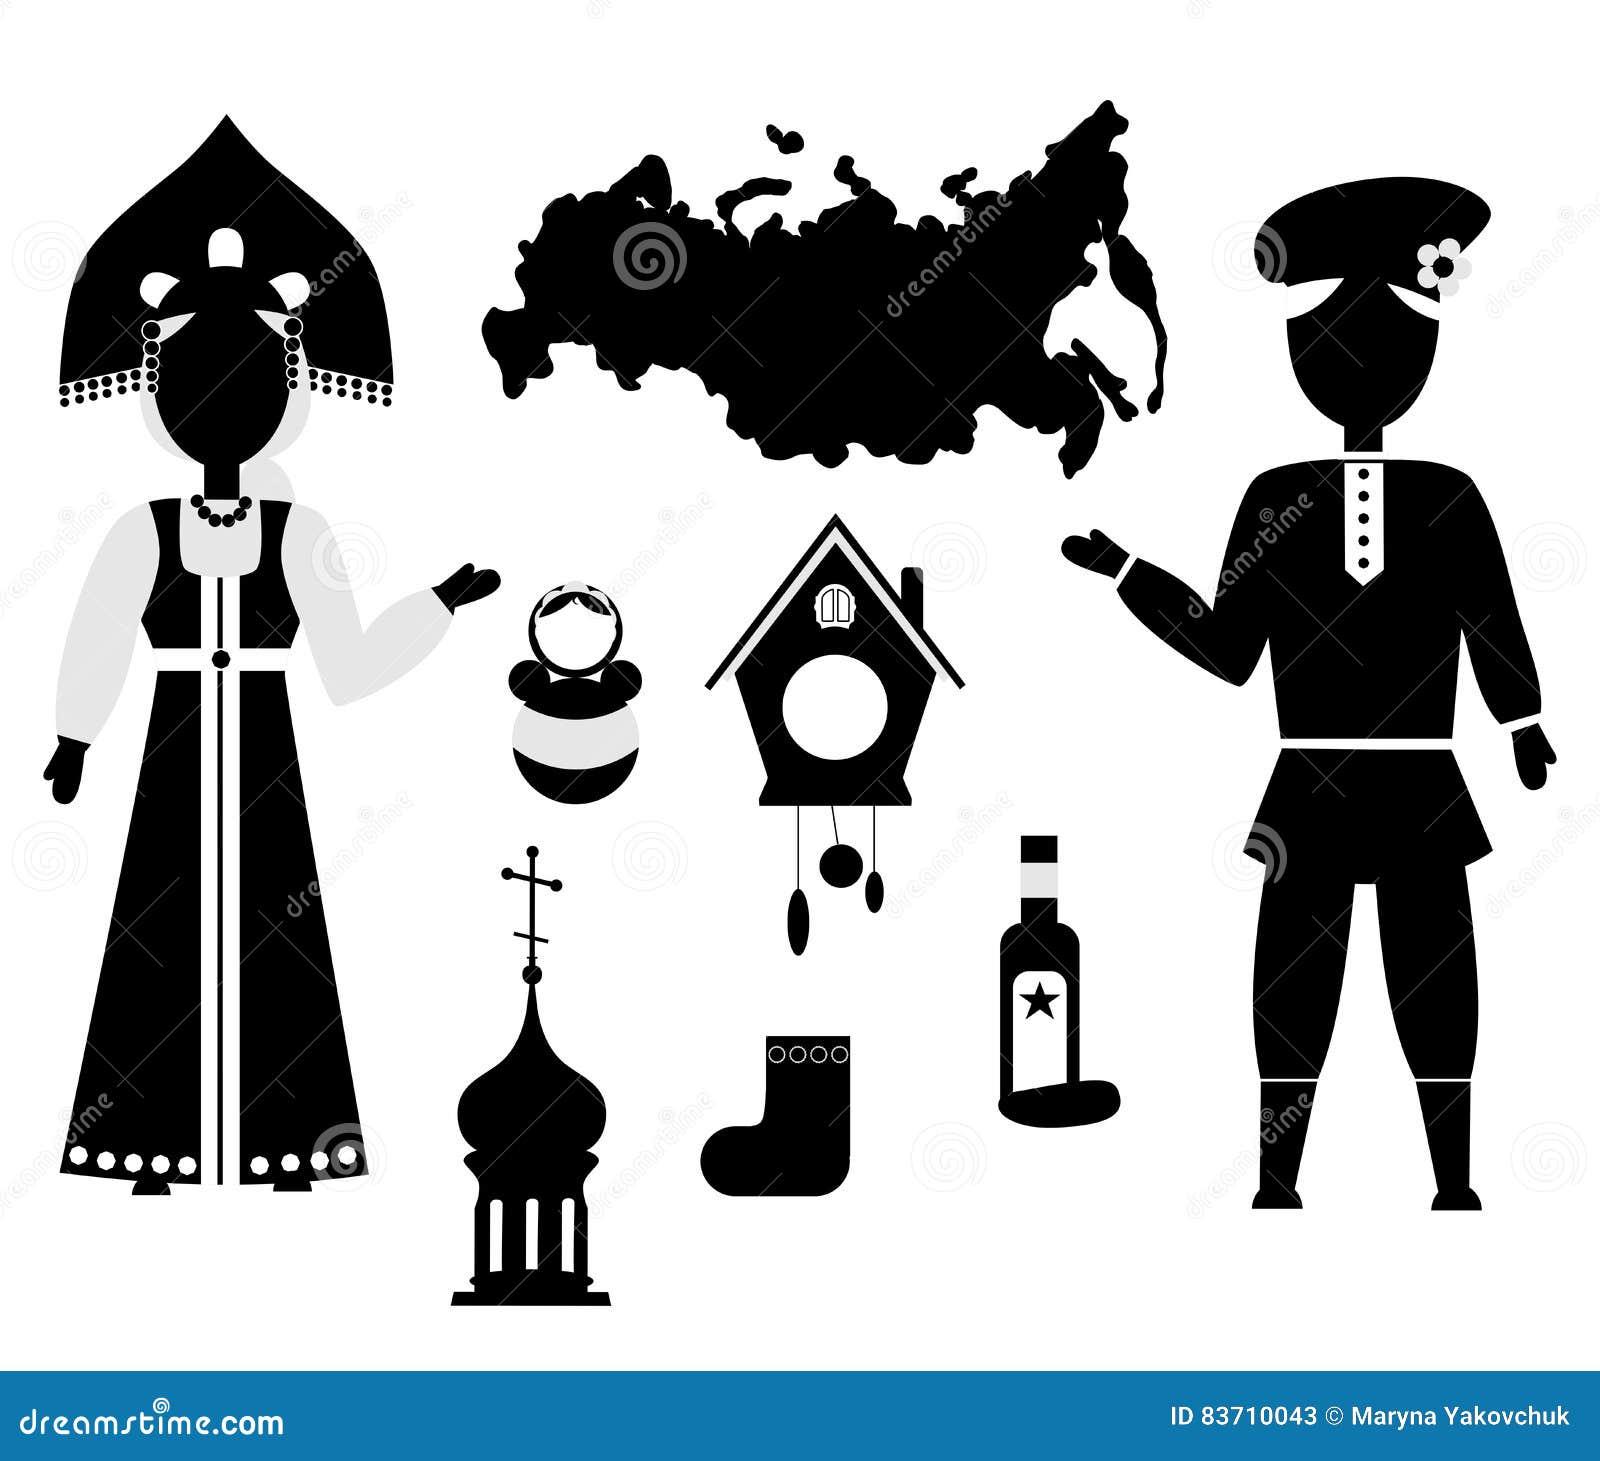 Russia Flat Design Black Stock Vector